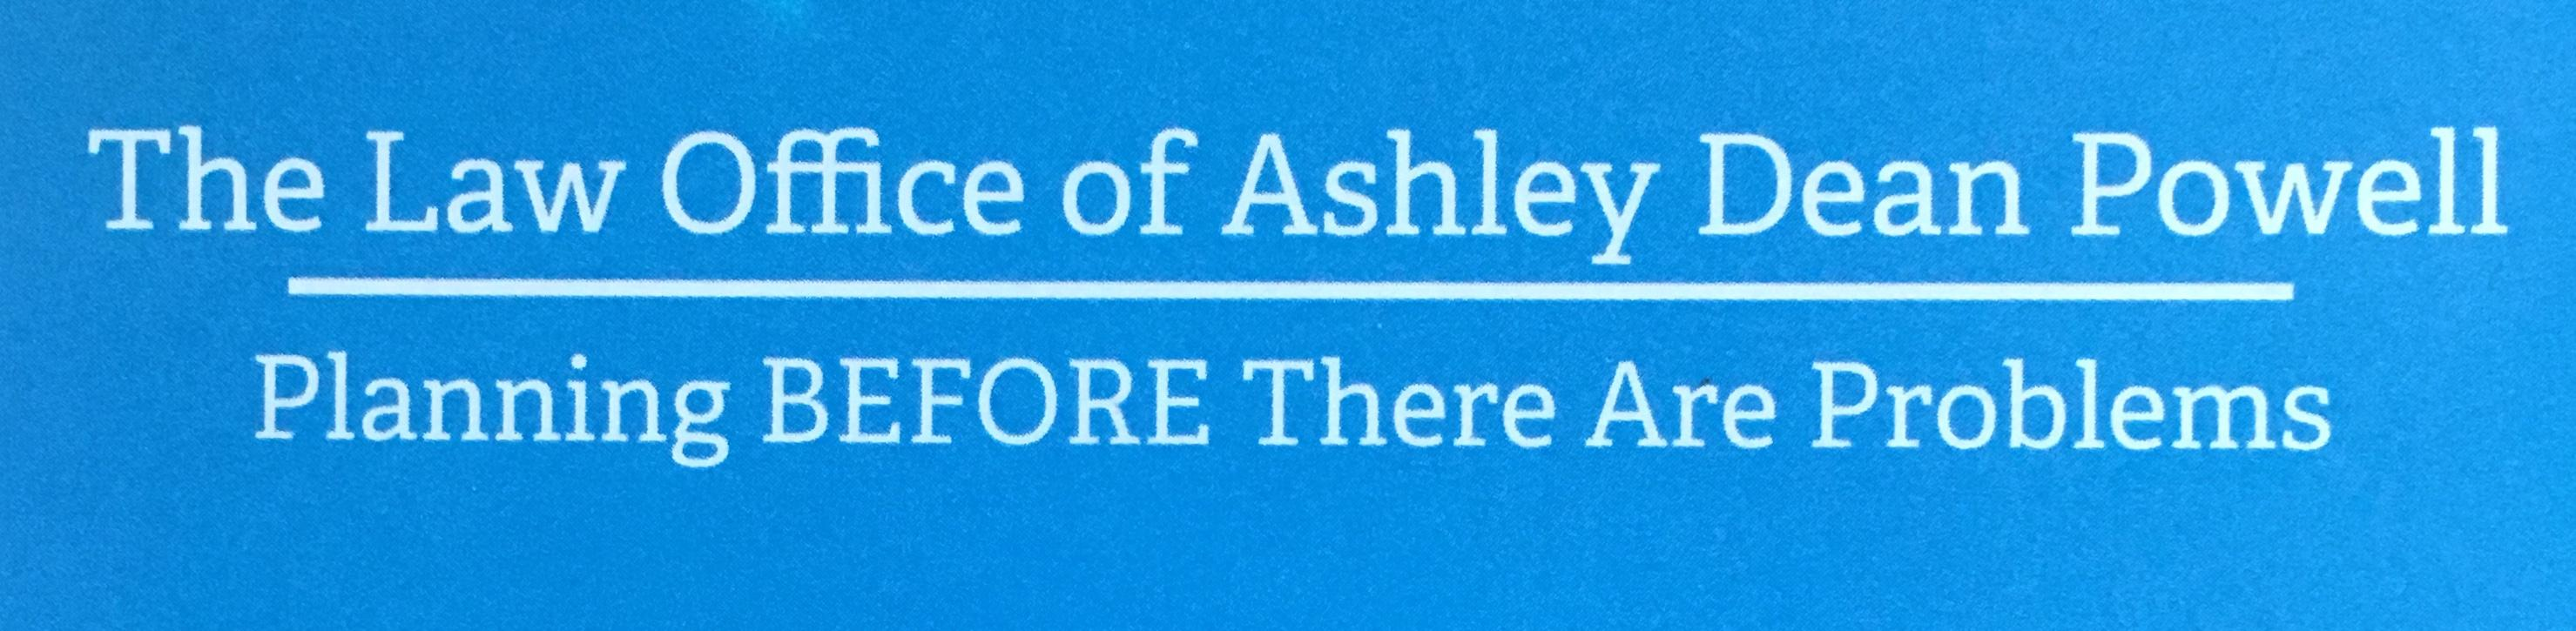 Law Office Of Ashley Dean Powell